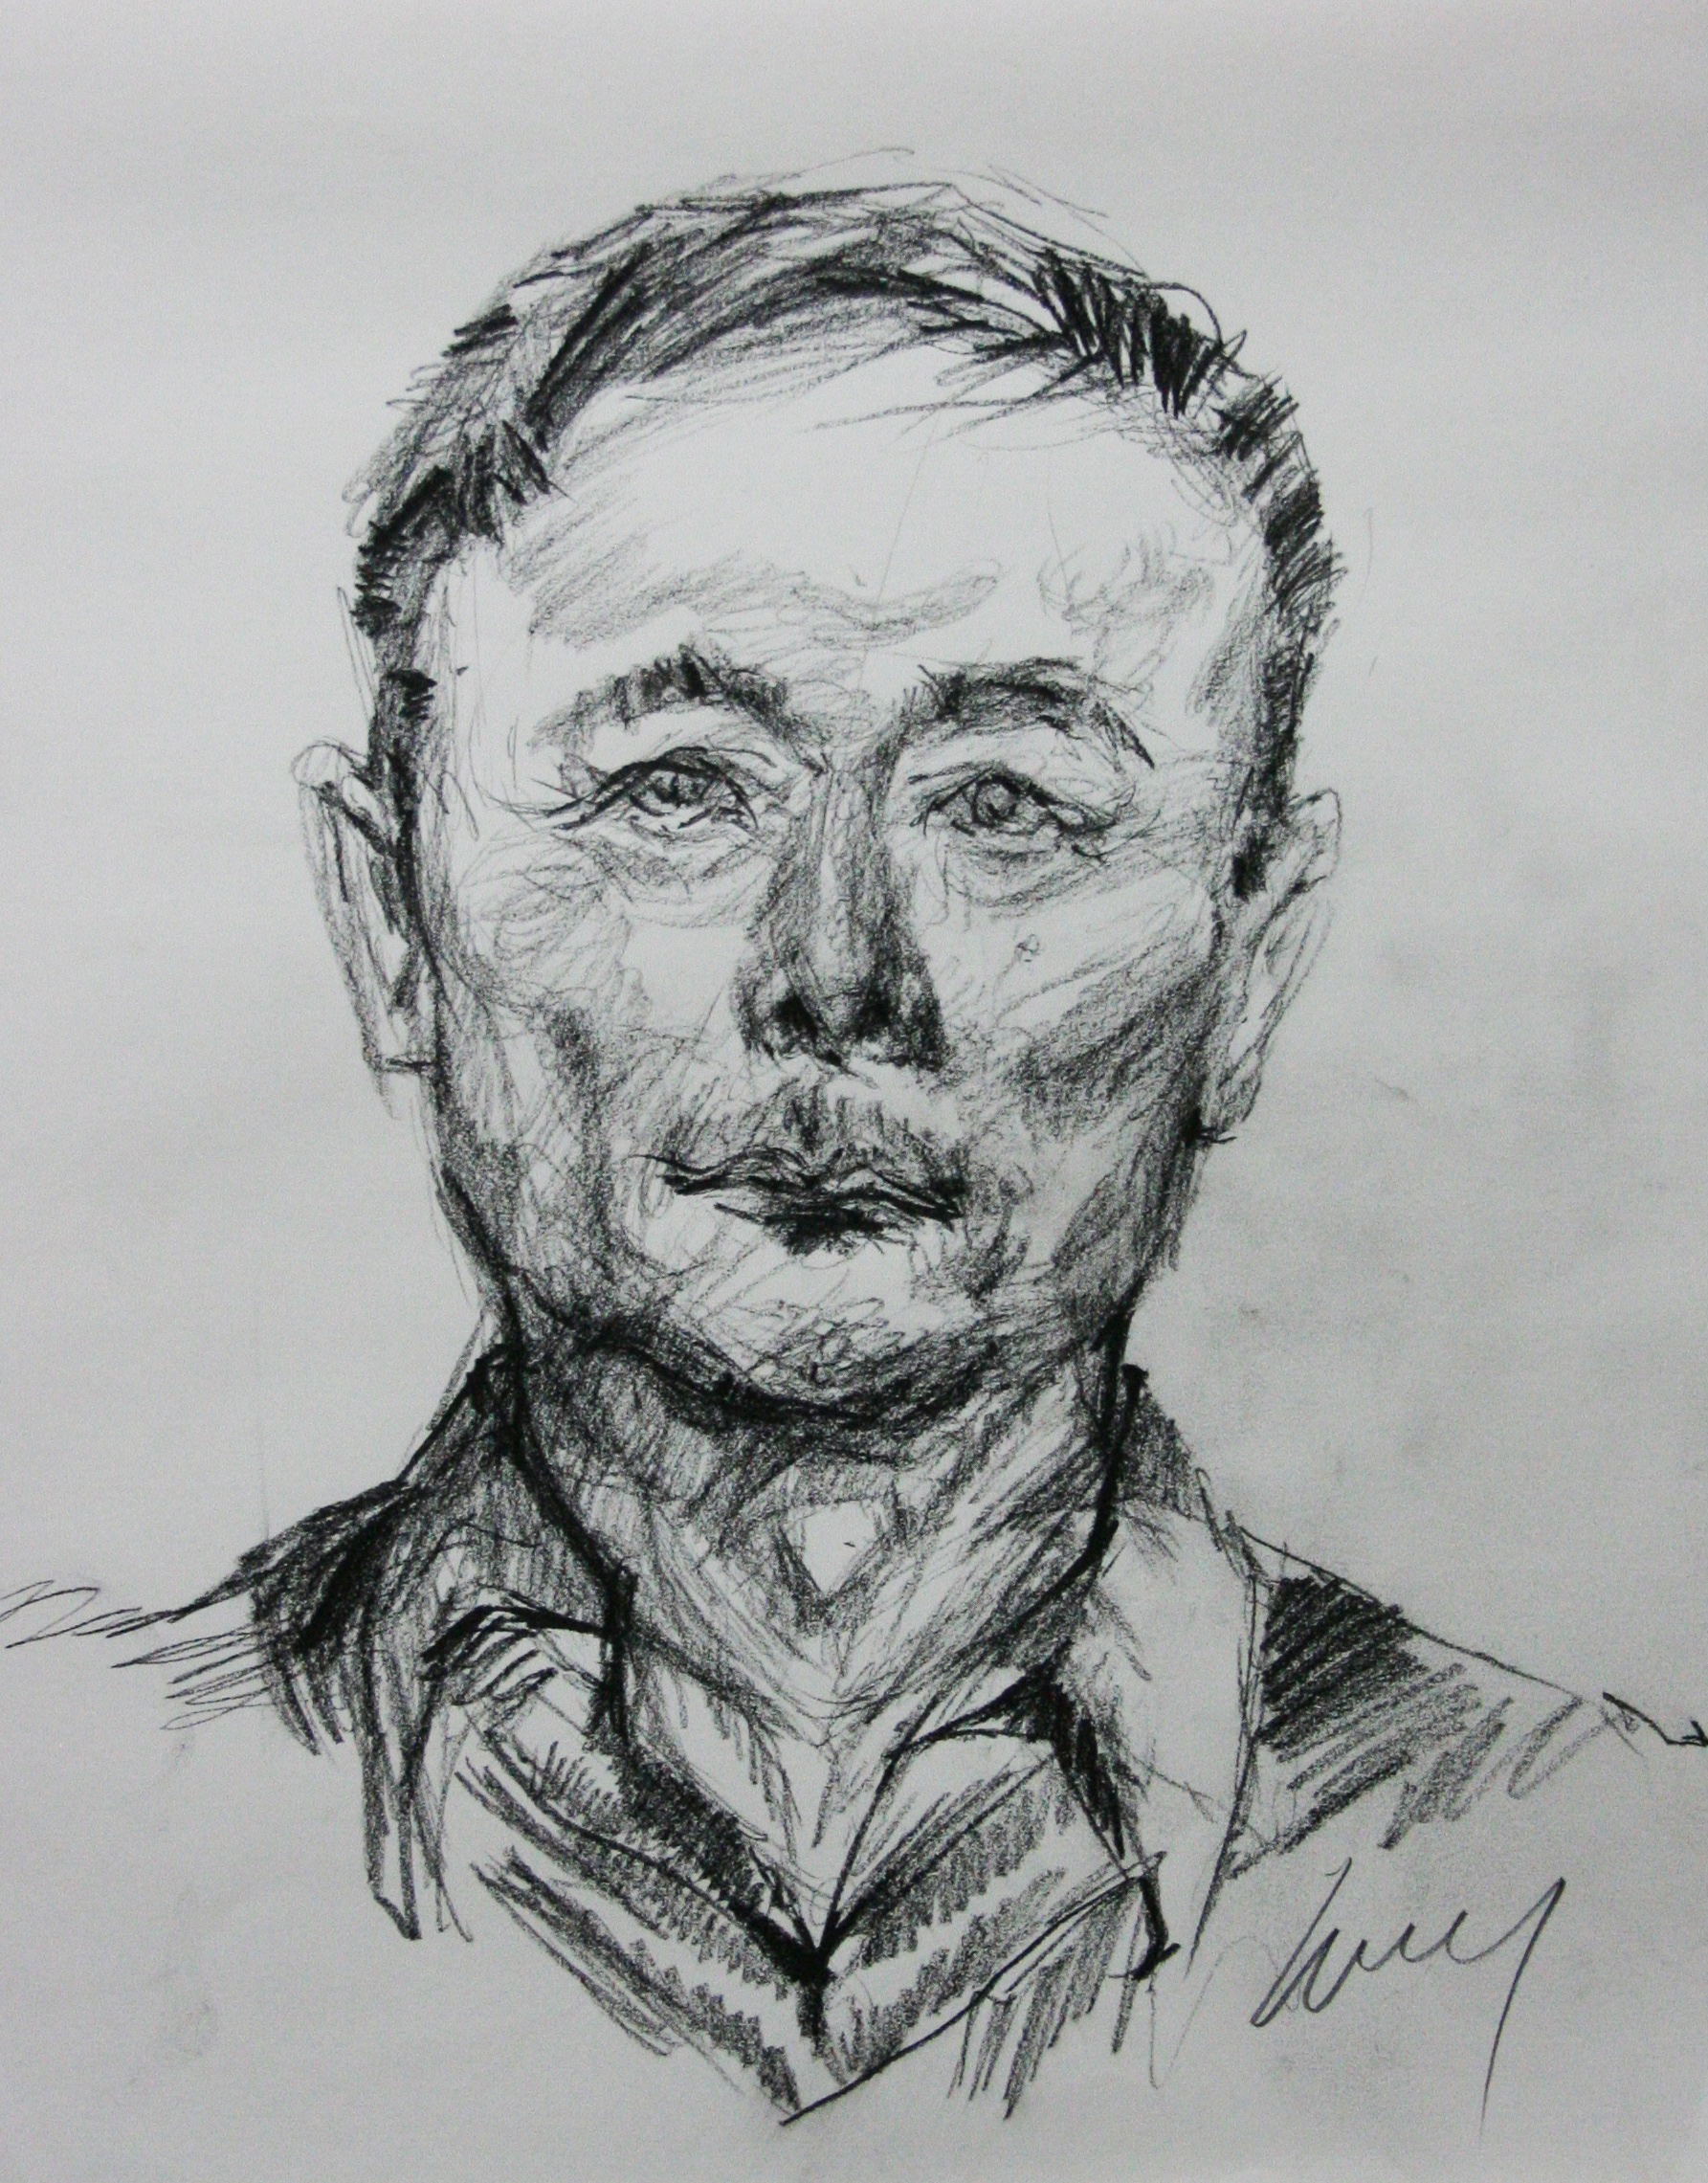 Larry Lee Tinsley did this half hour sketch.